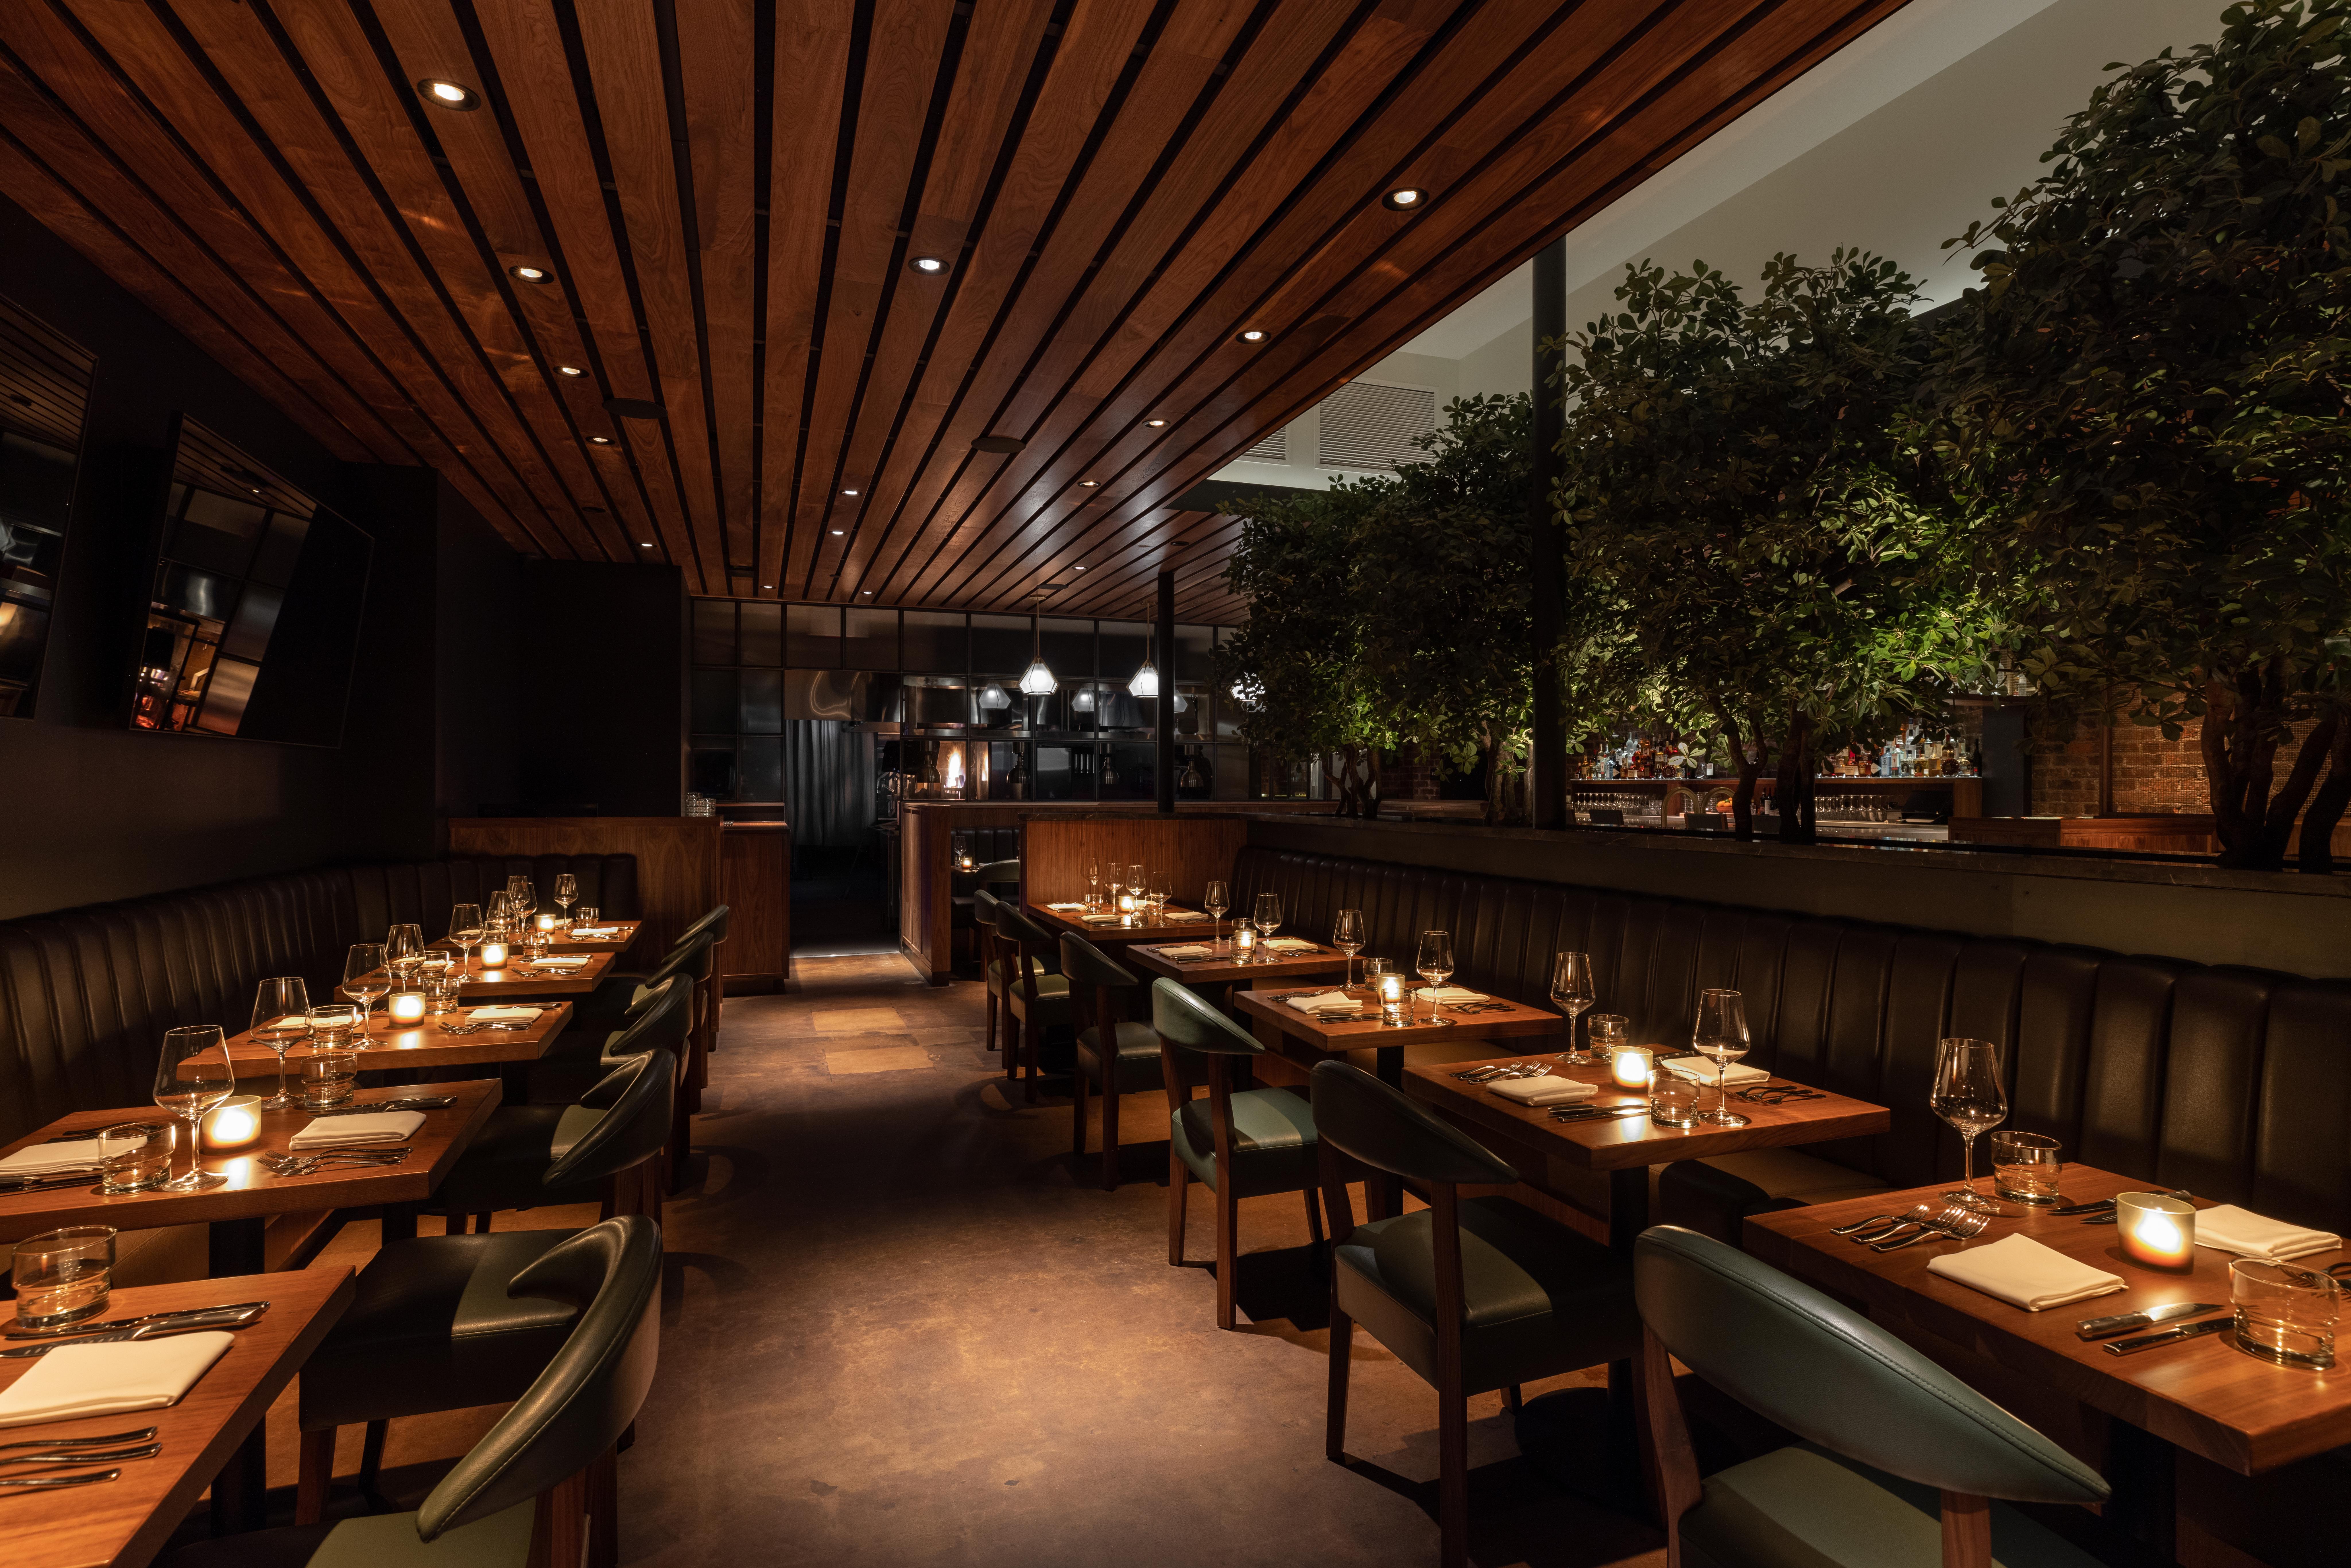 Matu restaurant interior in Beverly Hills, California